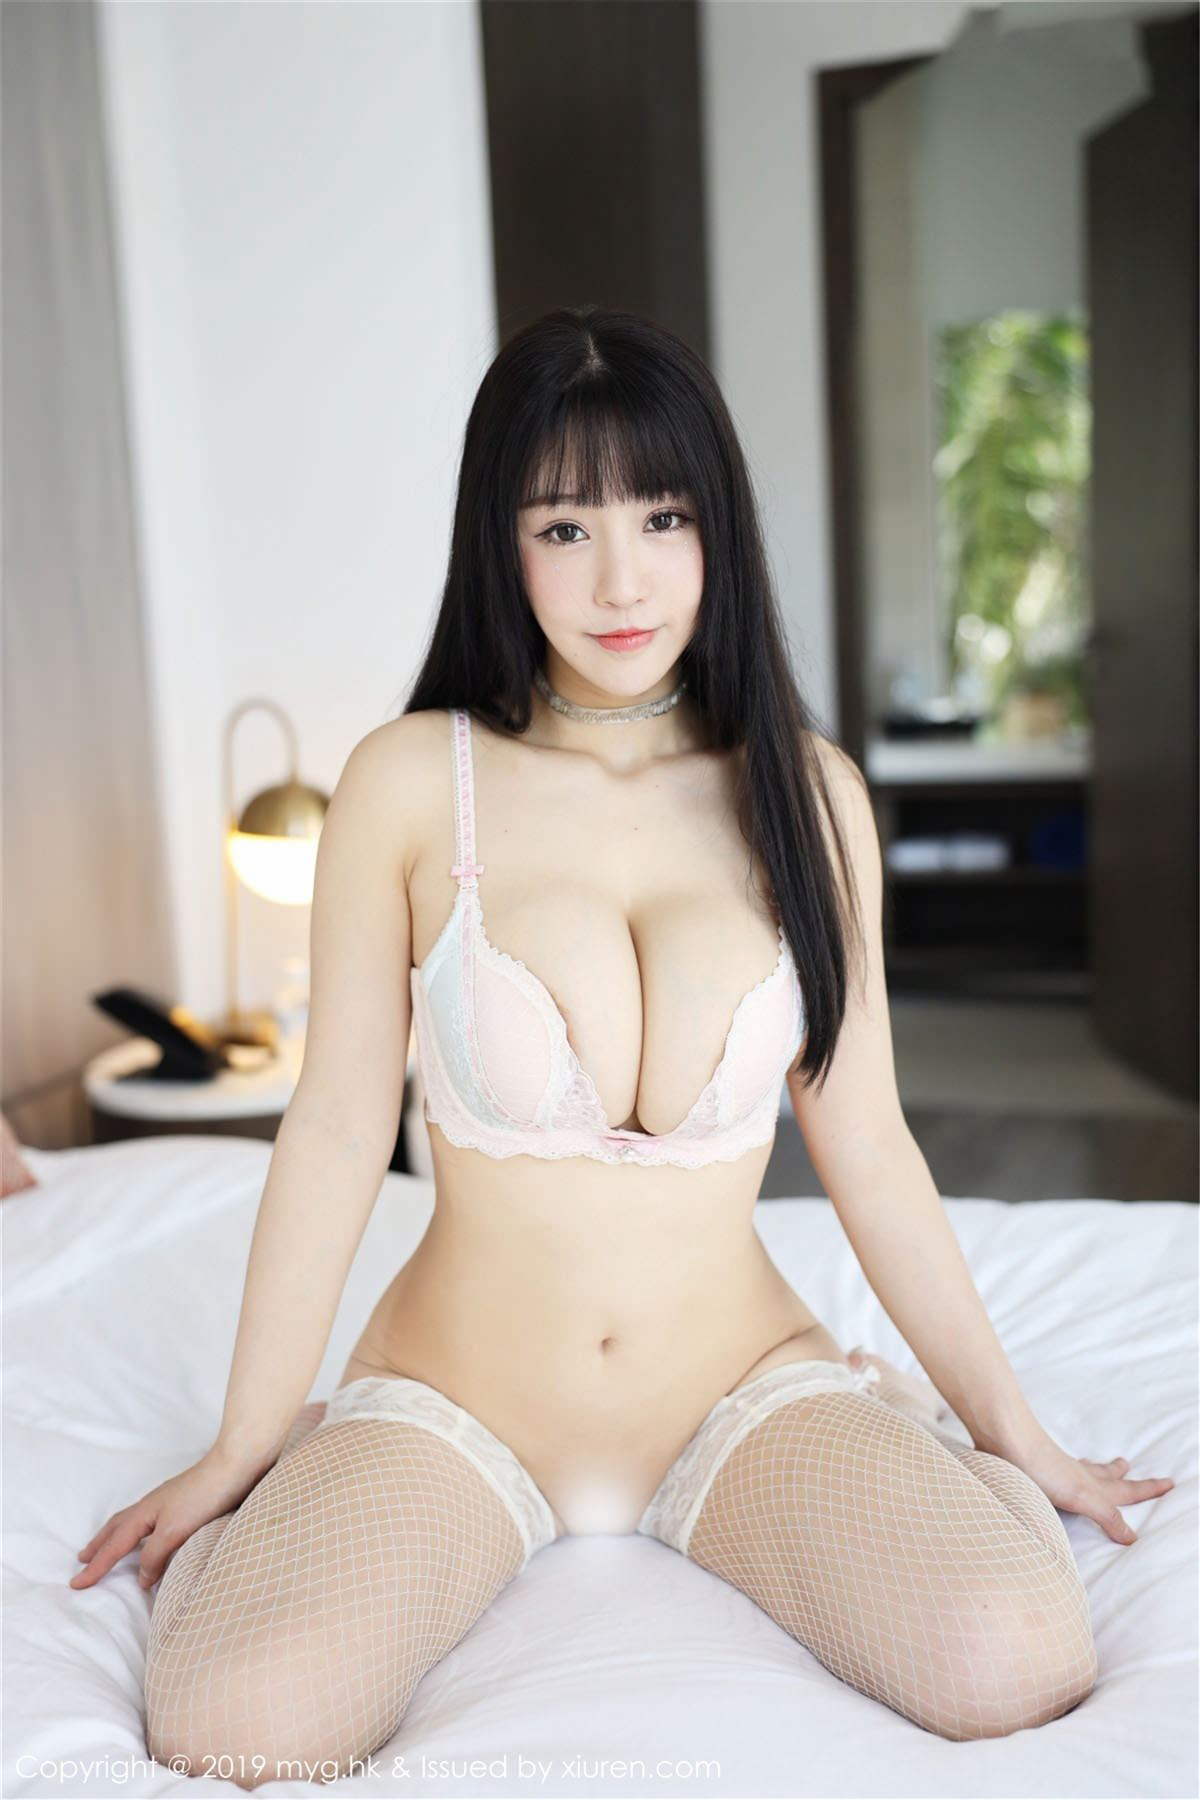 MyGirl Vol.364 28P, mygirl, Zhu Ke Er